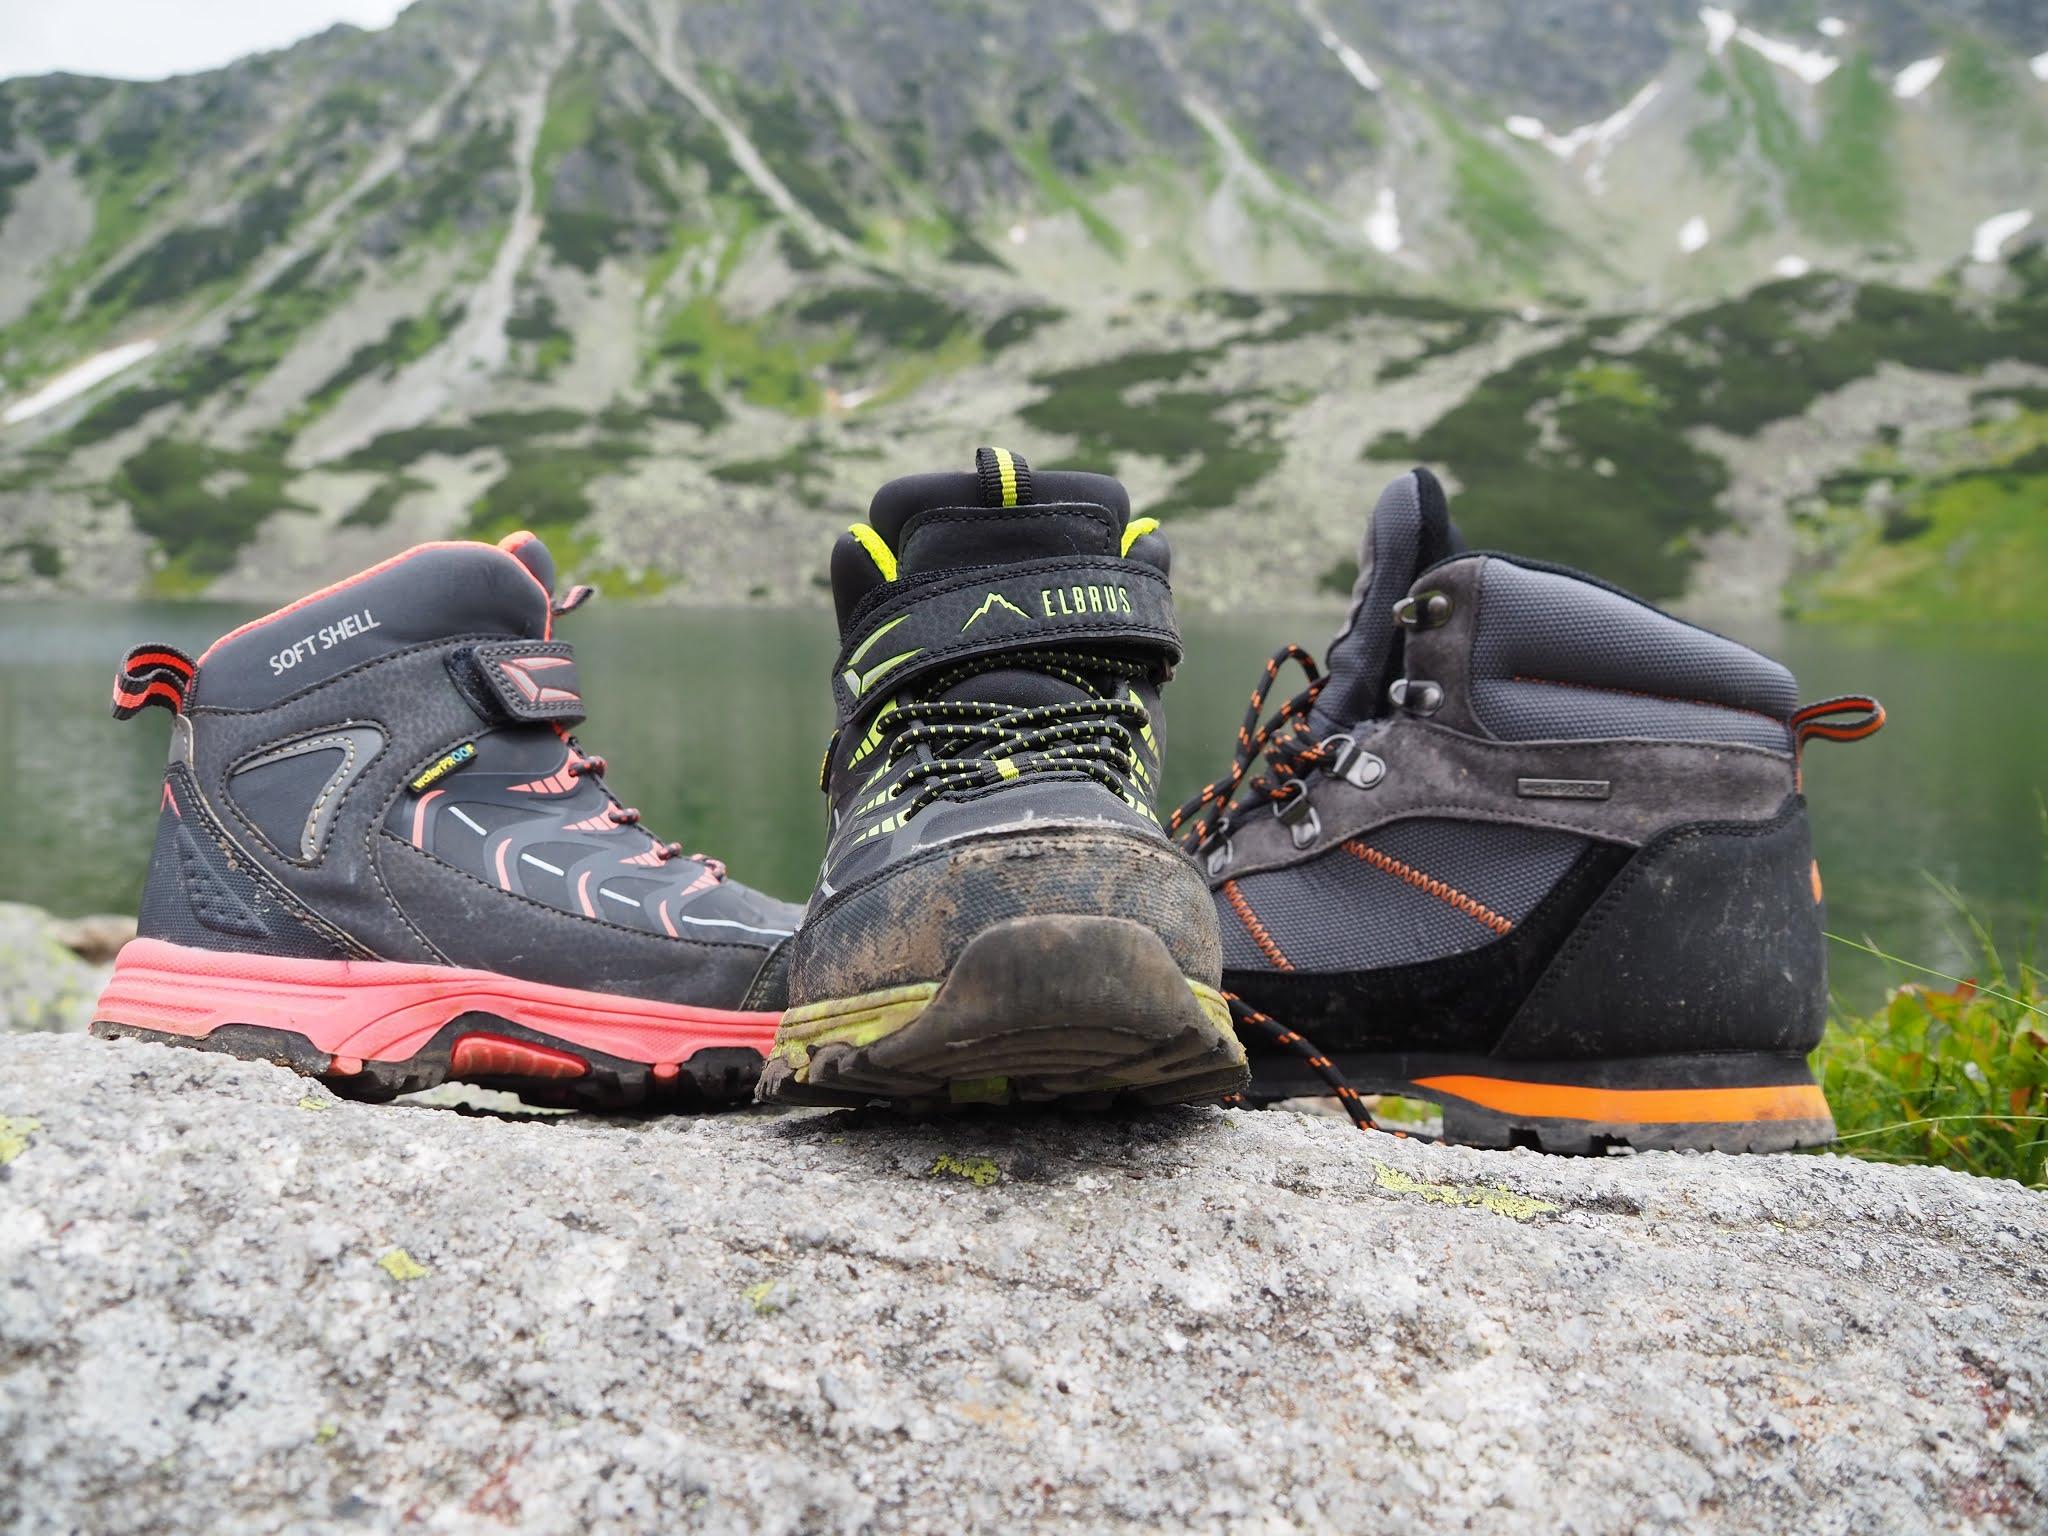 Elbrus Fitanu